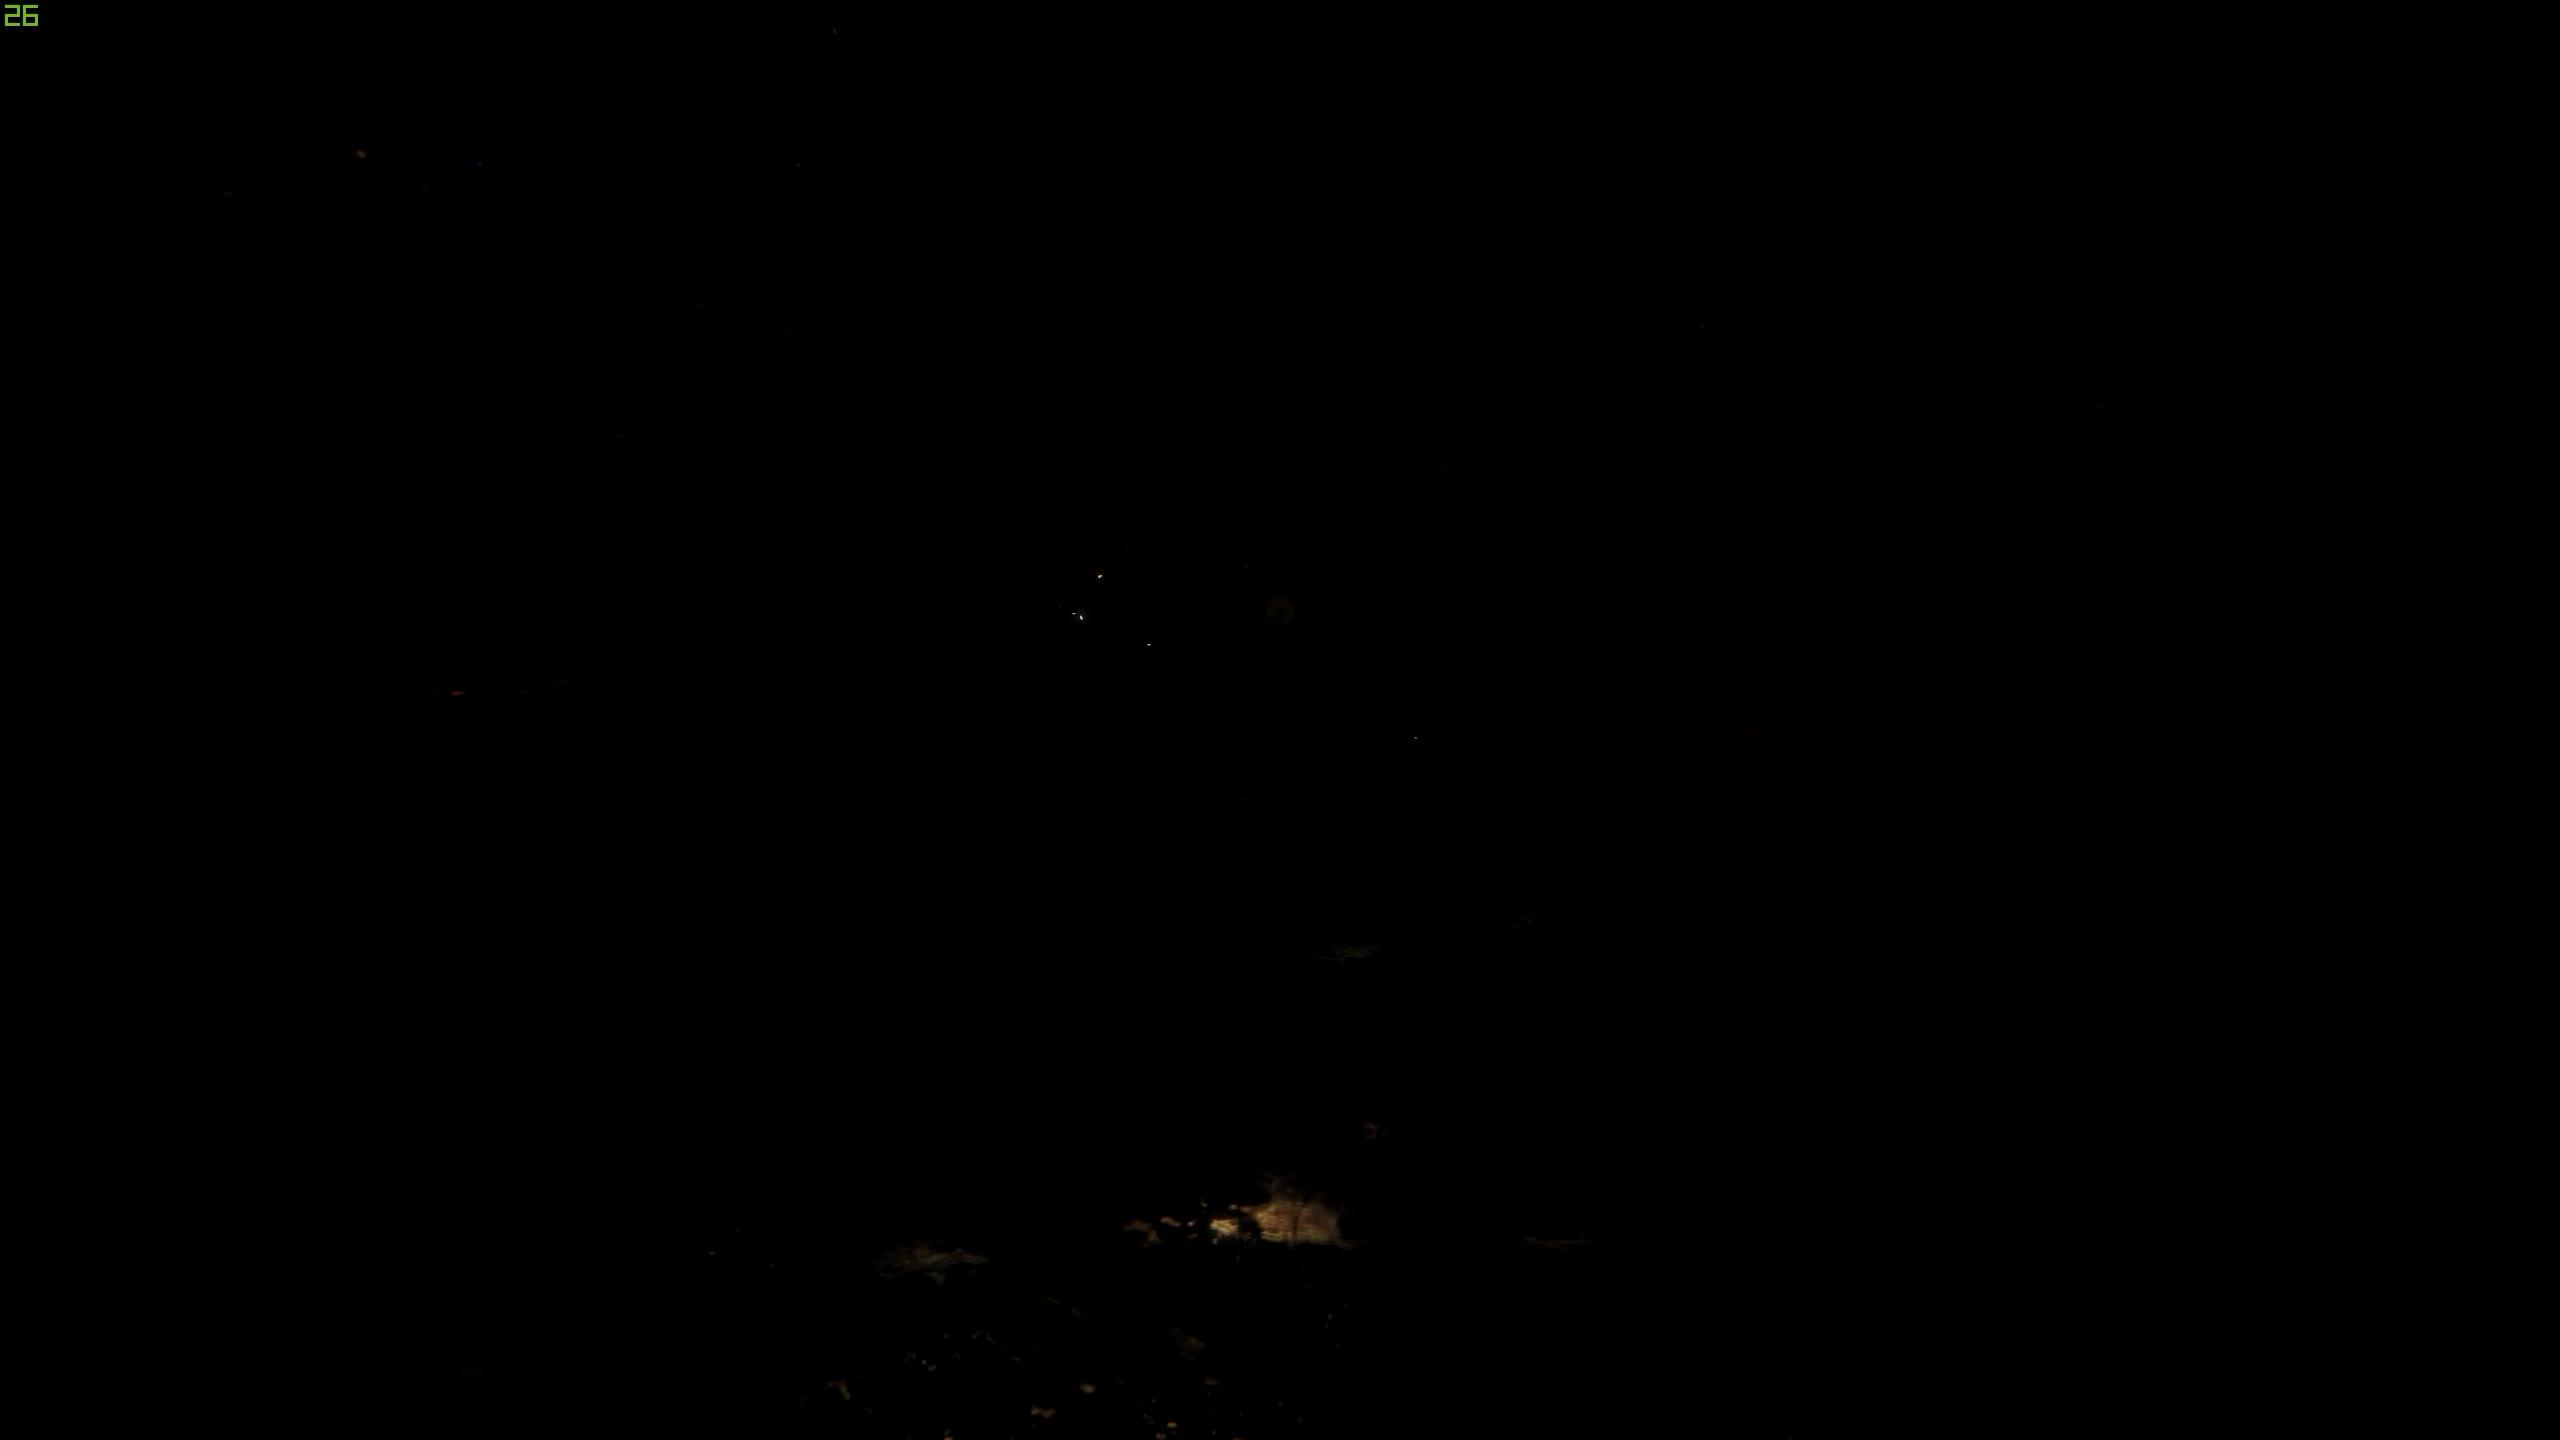 Kerbal Space Program ISS timelapse GIFs